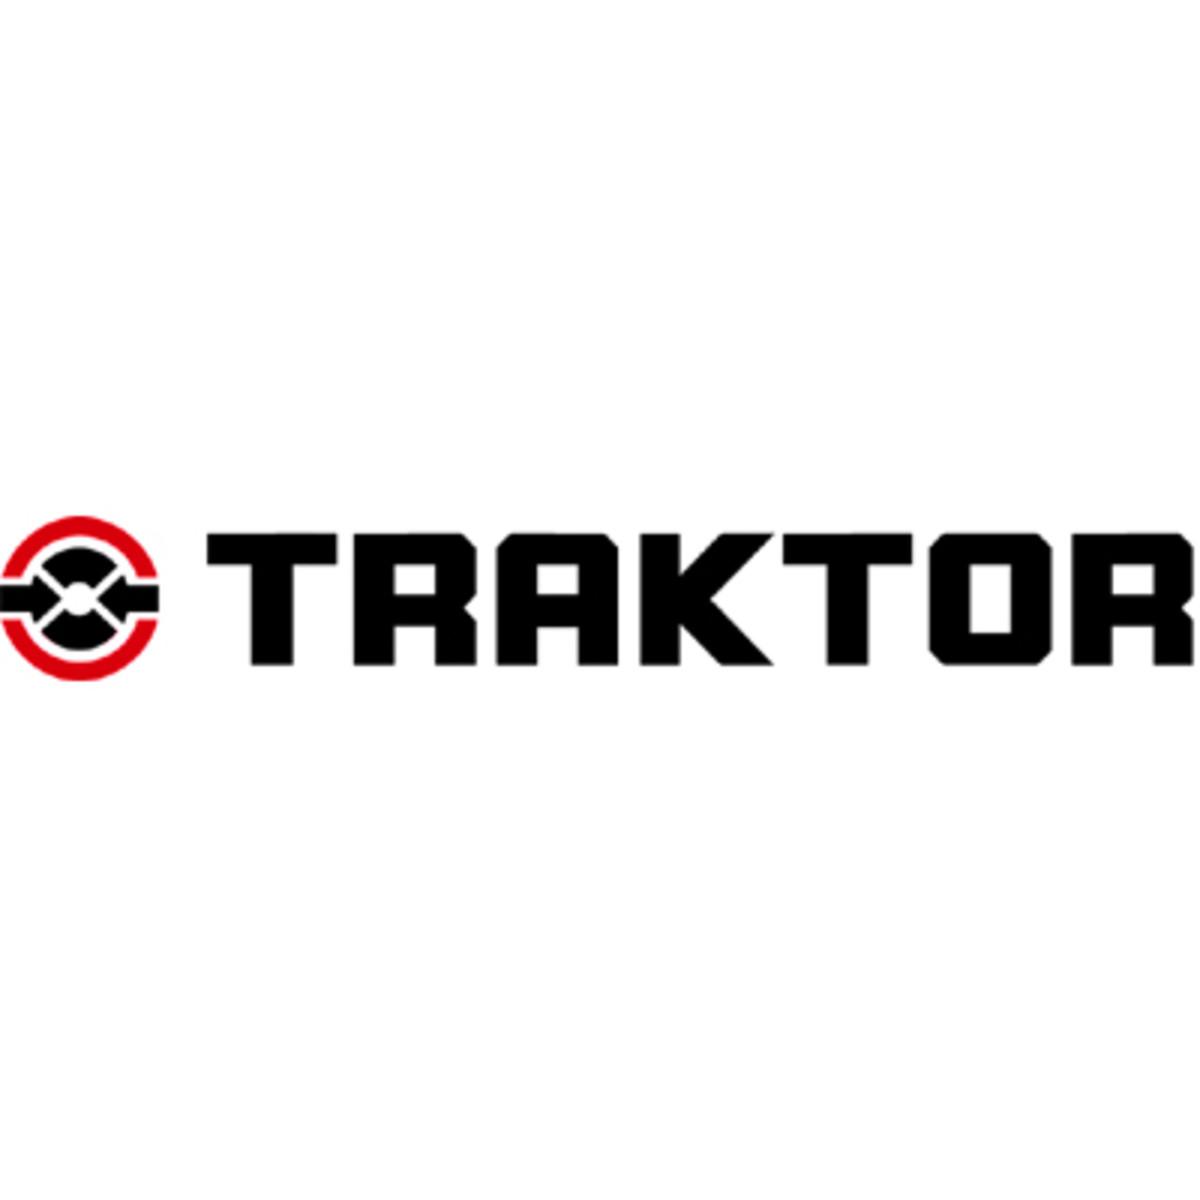 traktorlogo.jpg